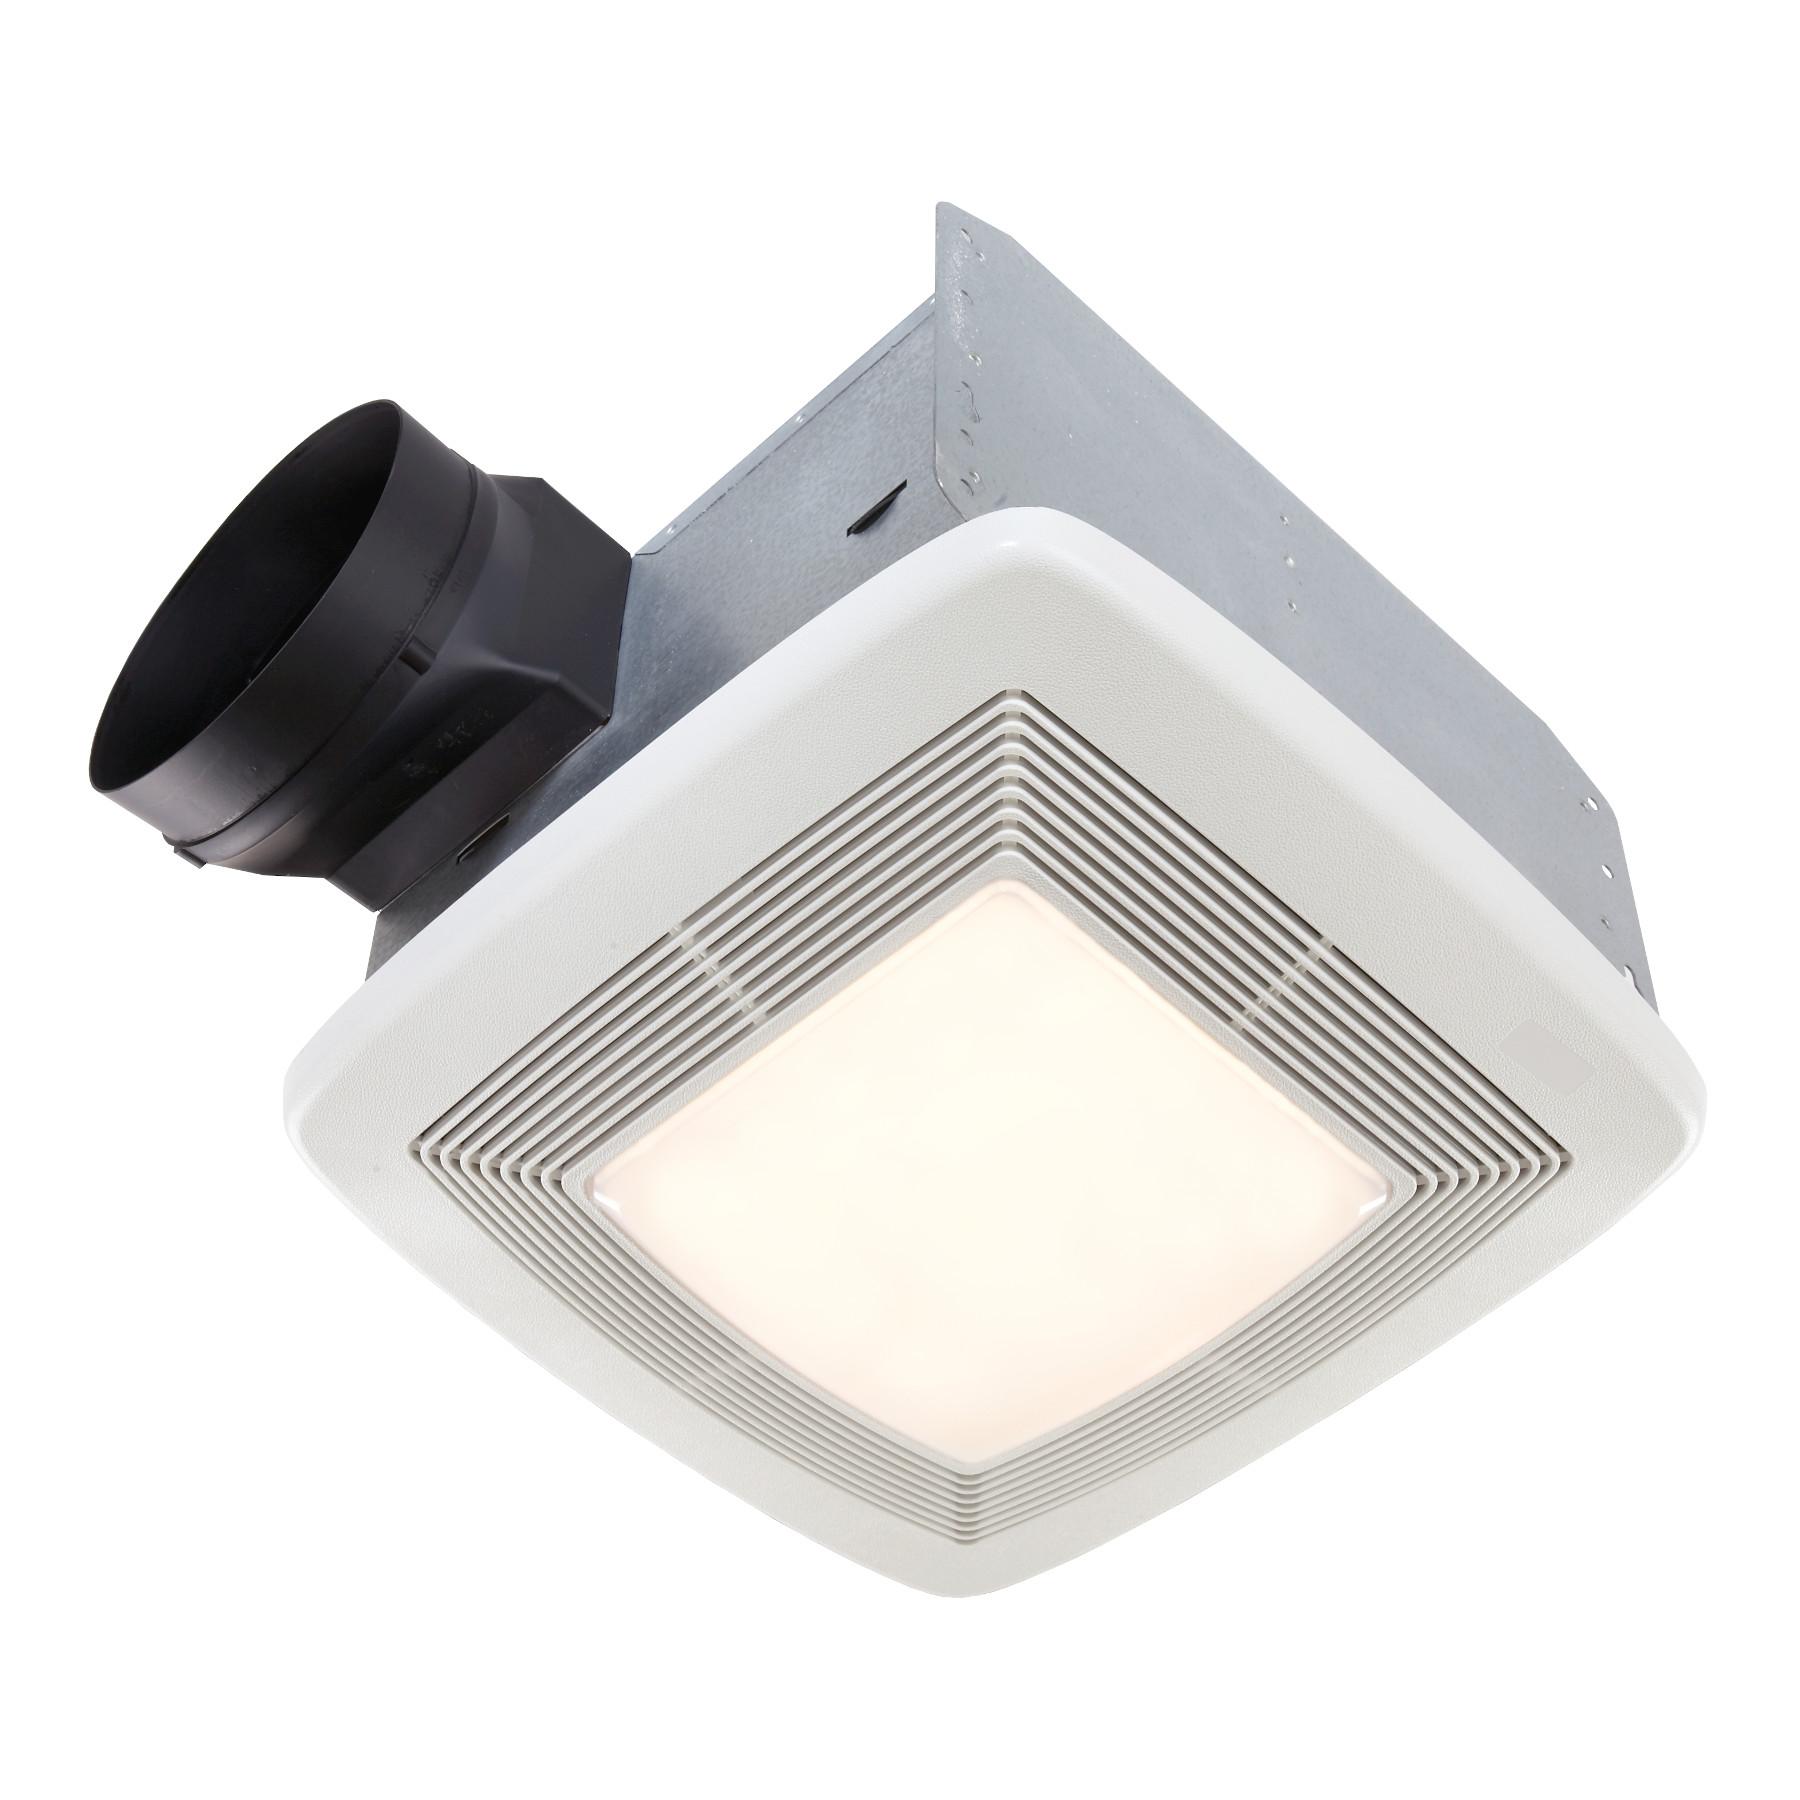 broan qtxe series 110 cfm ventilation fan light 36w fluorescent light 4w nightlight 0 7 sones e